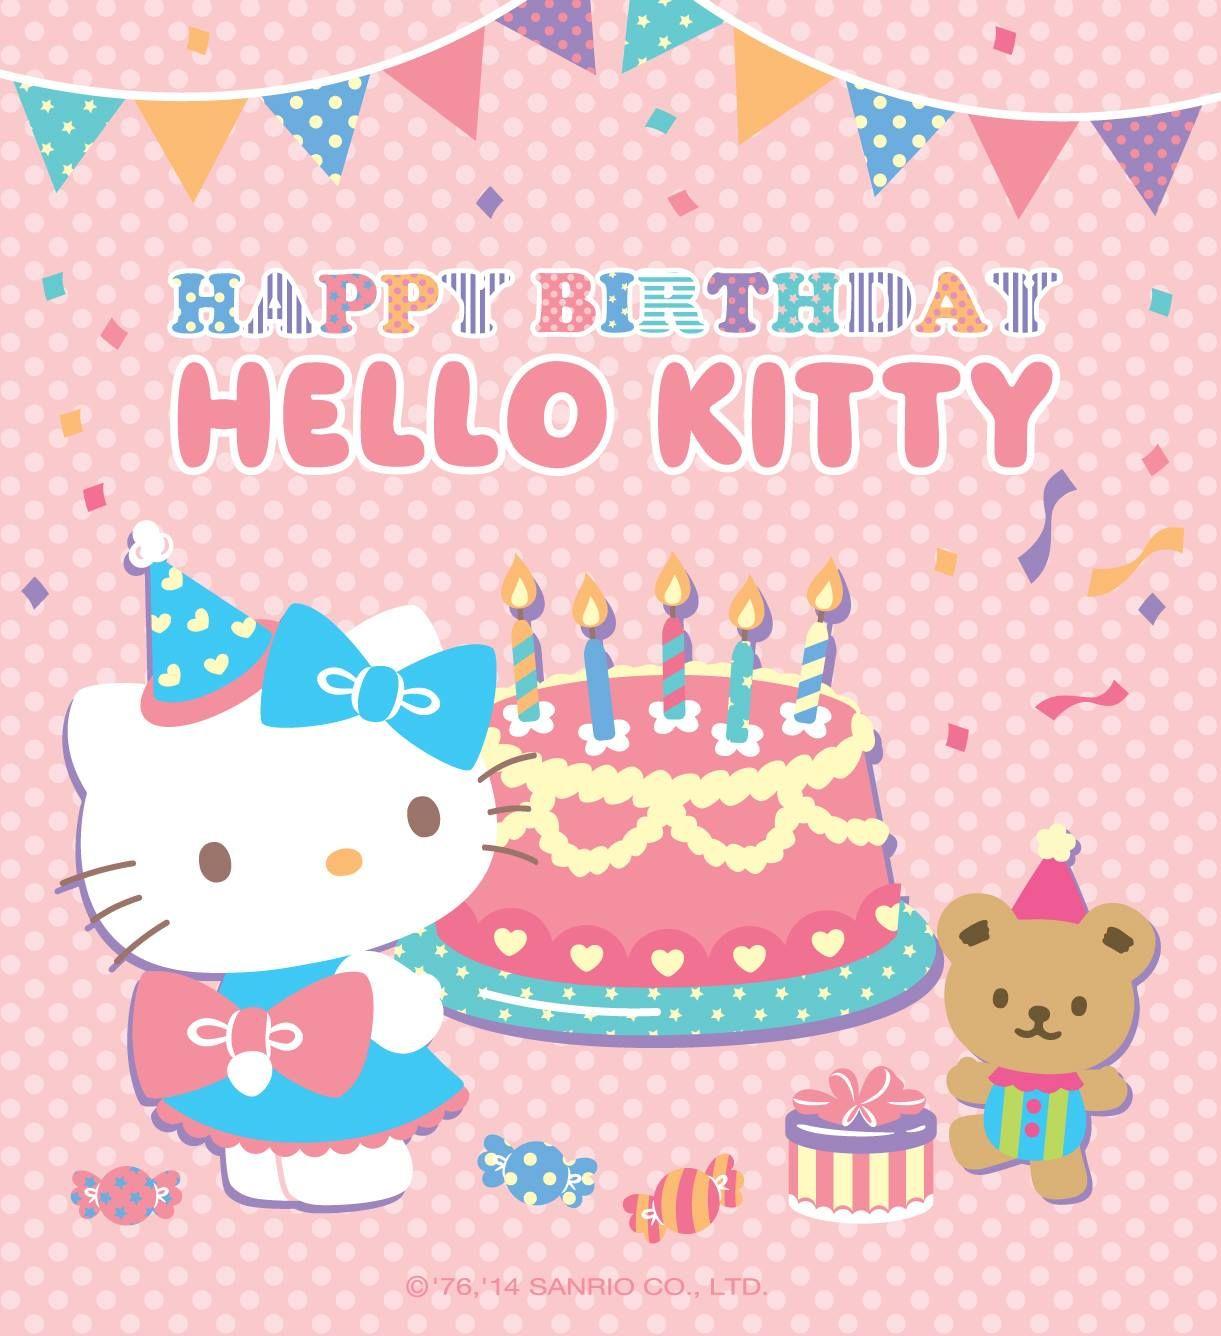 Sanrio Hello Kitty Hello Kitty Sanrio Pinterest Sanrio